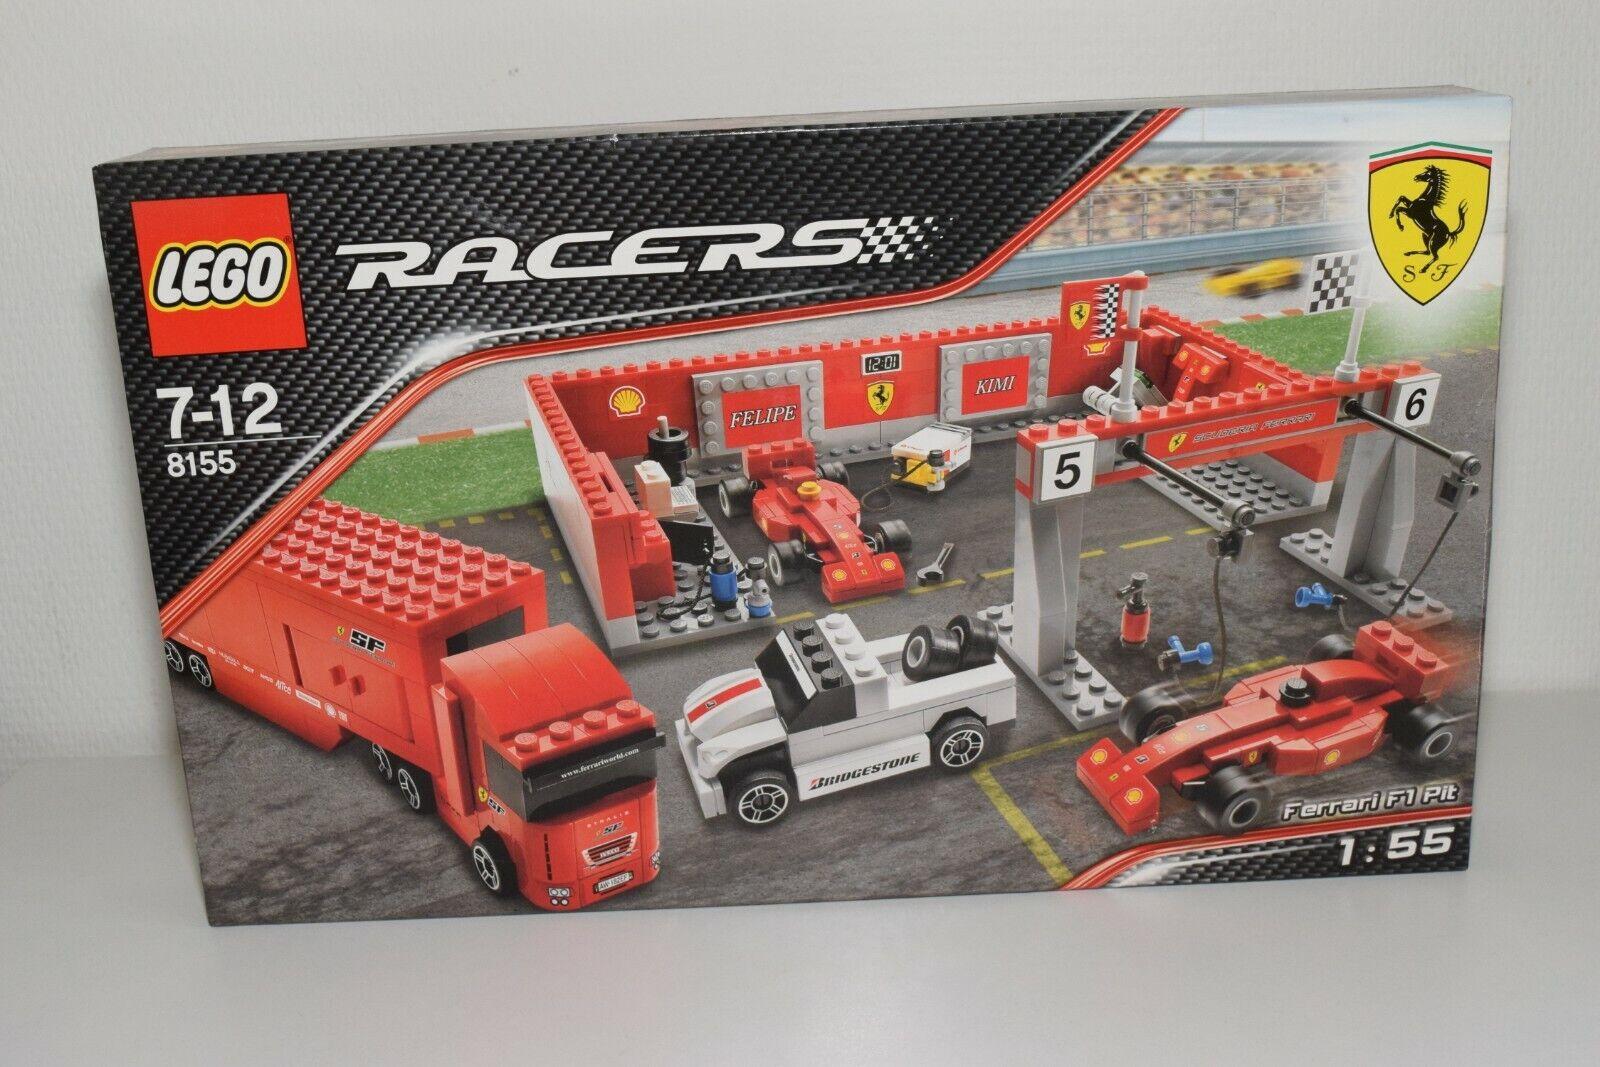 V LEGO 8155 FERRARI RACERS F1 FORMULA 1 PIT PITLANE PIT STOP SET MIB SEALED